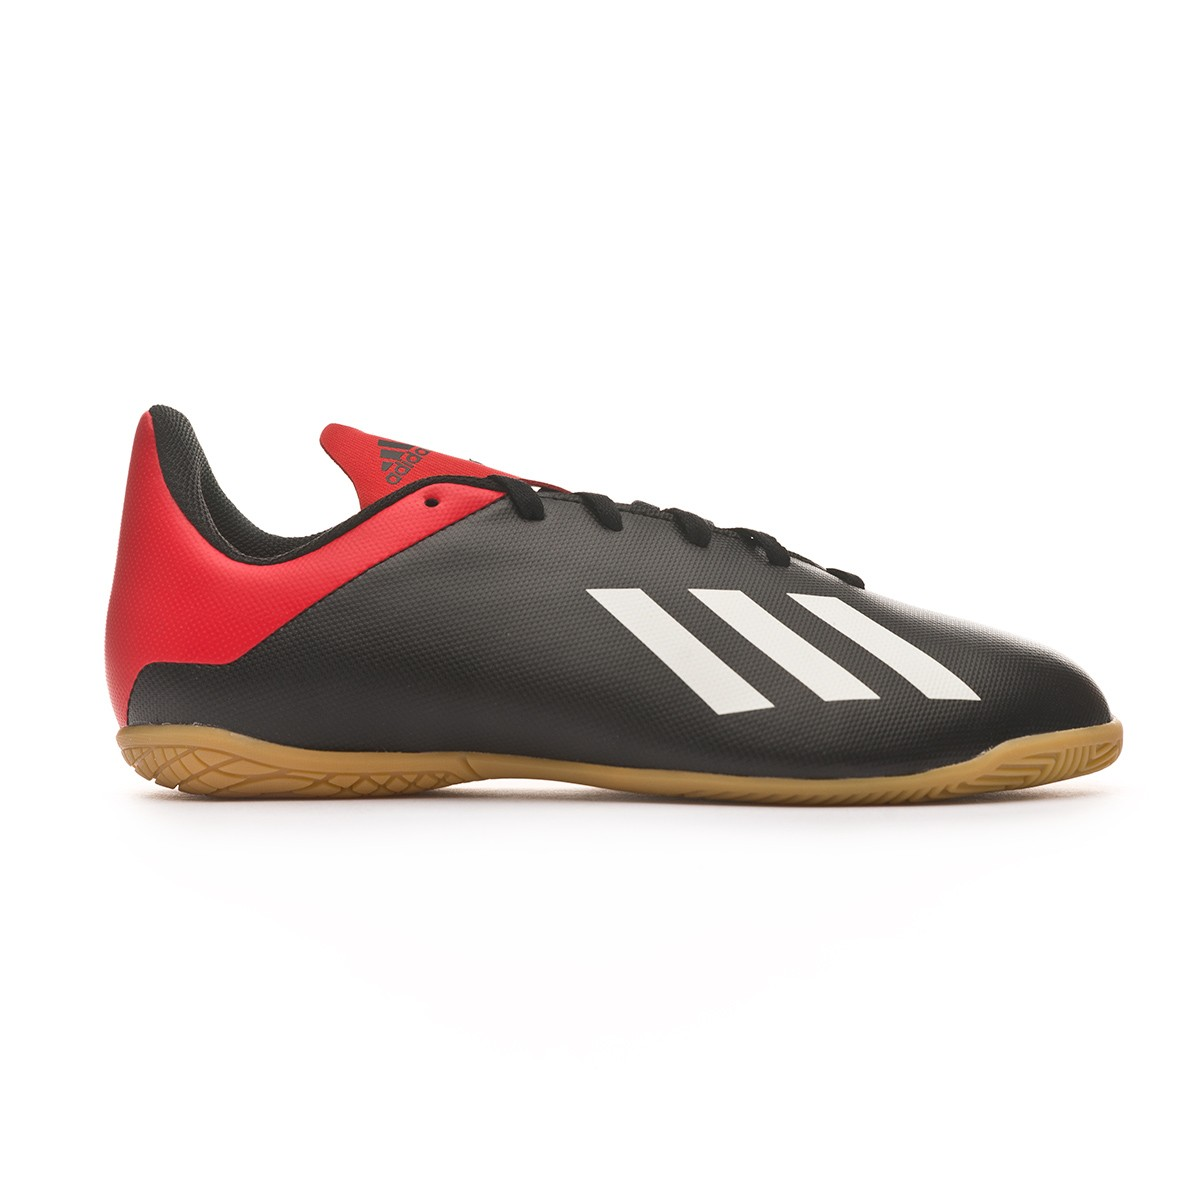 Sapatilha de Futsal adidas X Tango 18.4 IN Crianças